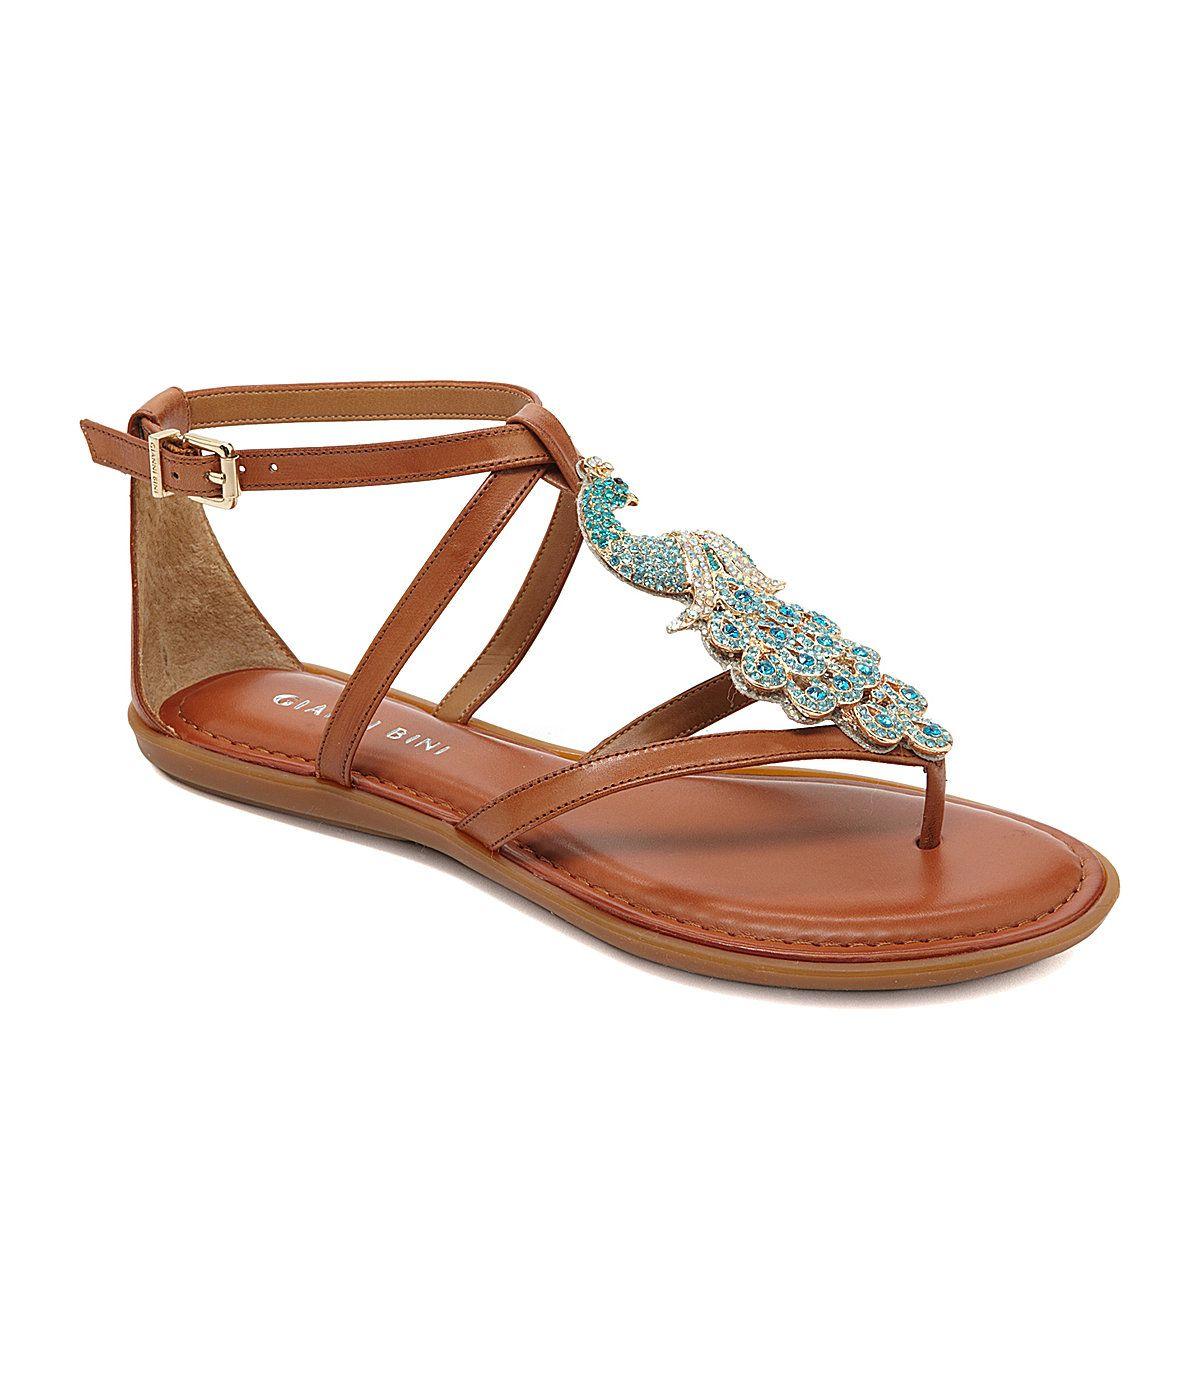 c883976d46d Gianni Bini Indigo Casual Flat Sandals ~ Peacock!!!!!!